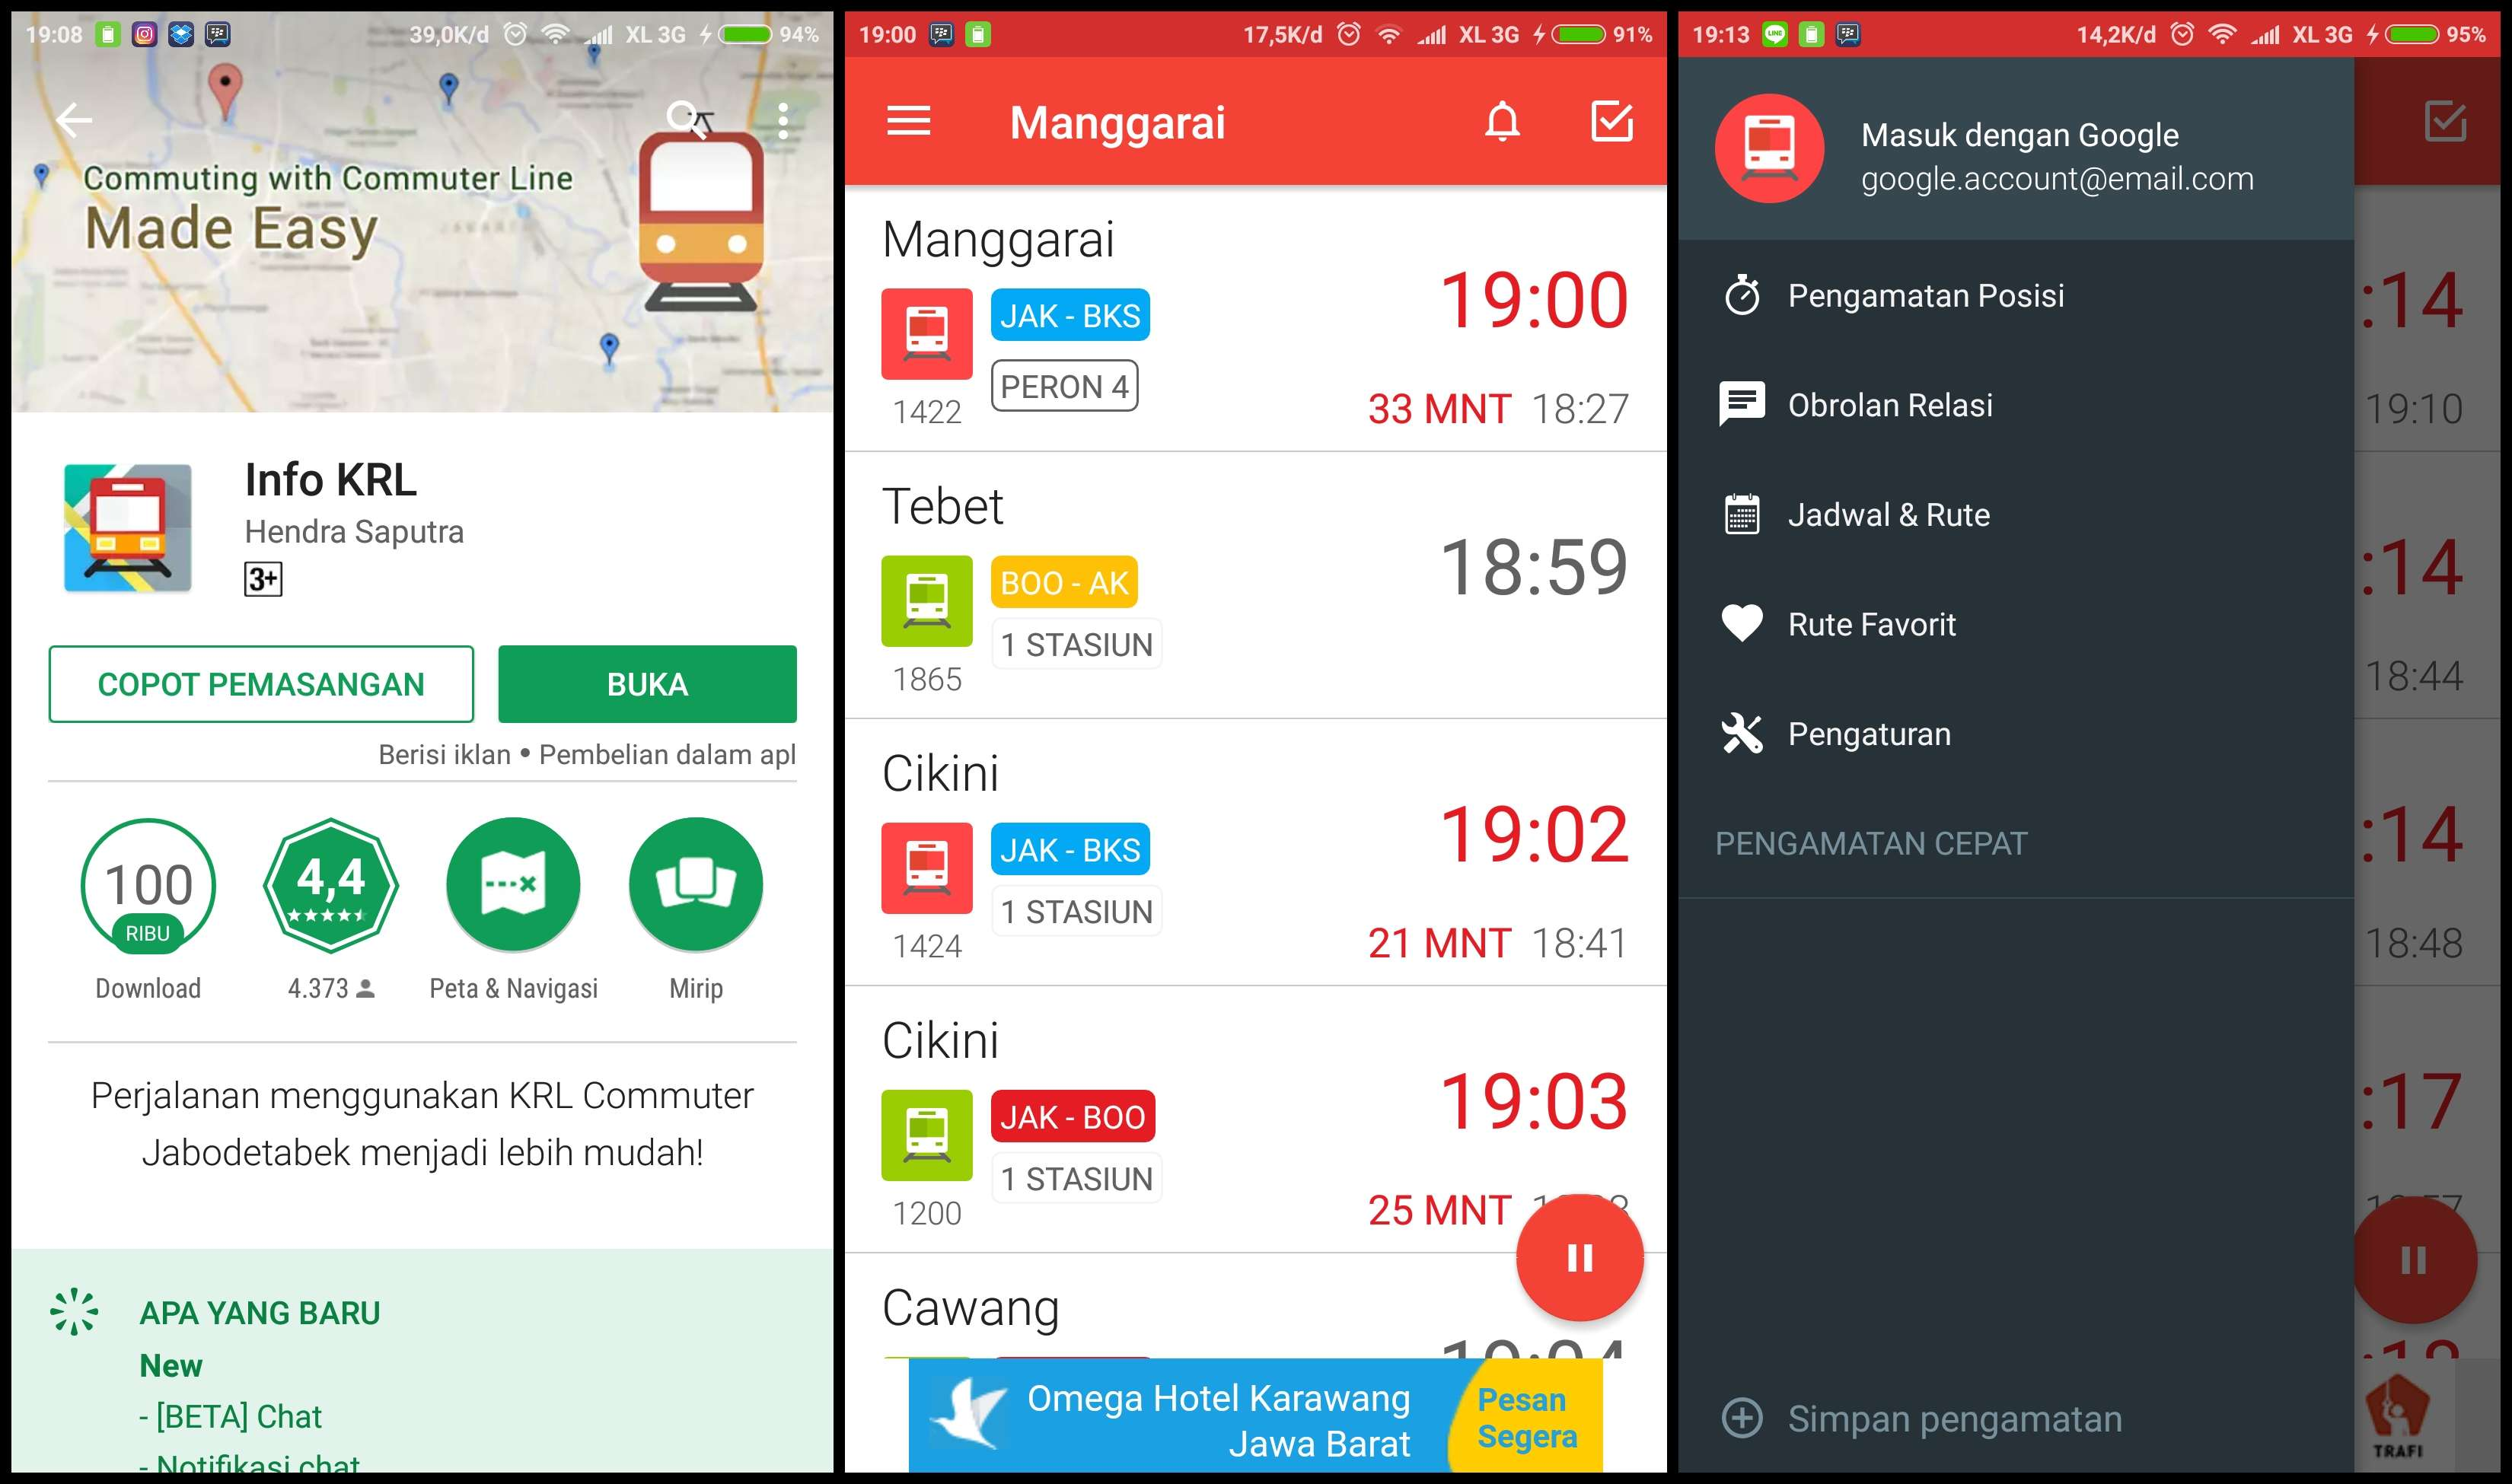 Ini Dia Aplikasi Wajib Unduh Bagi Para Pengguna Transportasi Umum Jabodetabek Kaori Nusantara